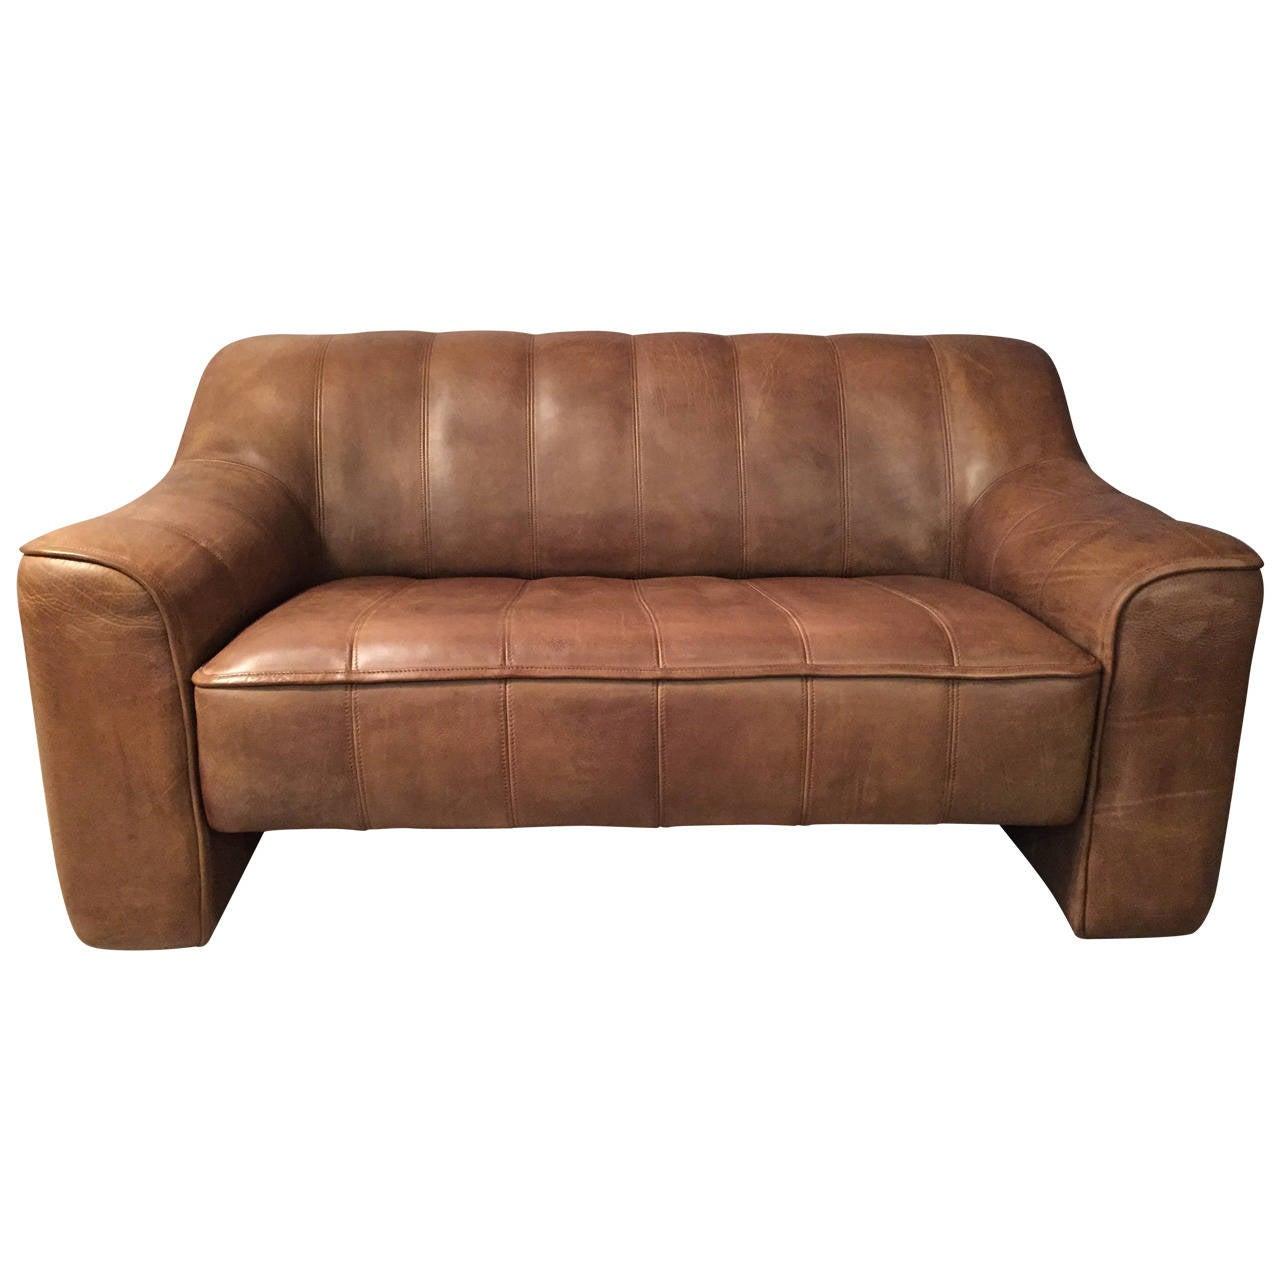 de sede ds44 two seat sofa at 1stdibs. Black Bedroom Furniture Sets. Home Design Ideas